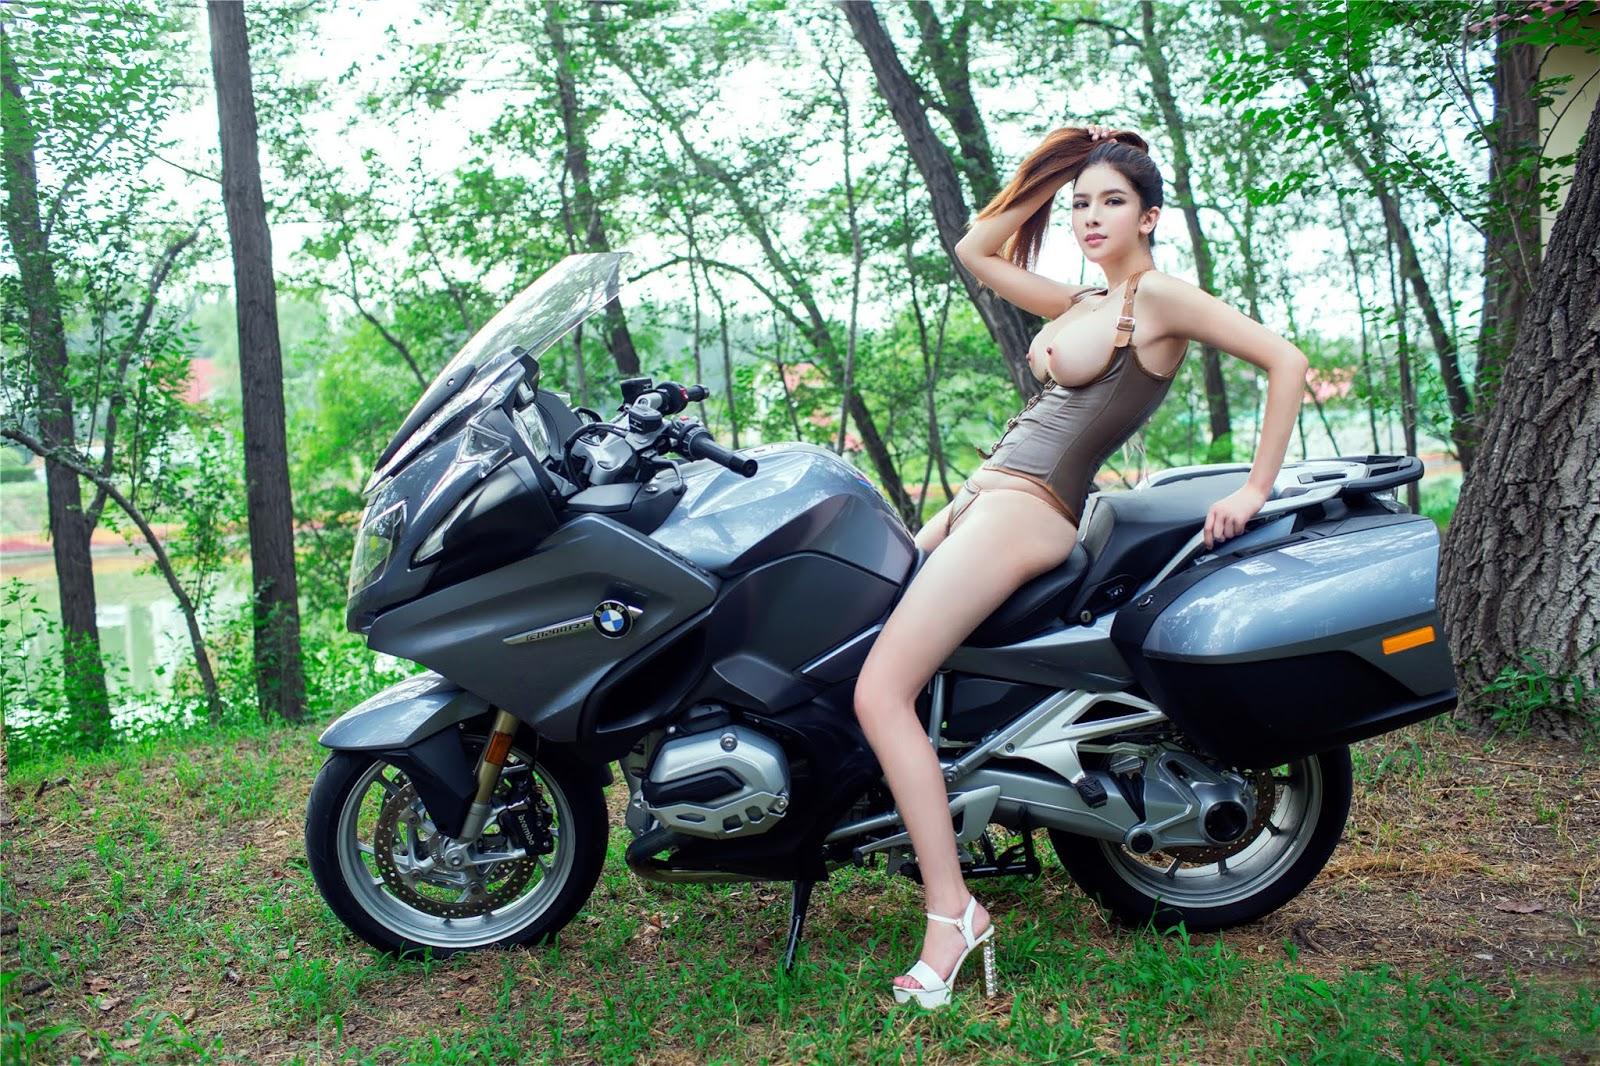 BoolWowGirls%2B%252841%2529 - Li LiSha 李丽莎 Beautiful Nude Model